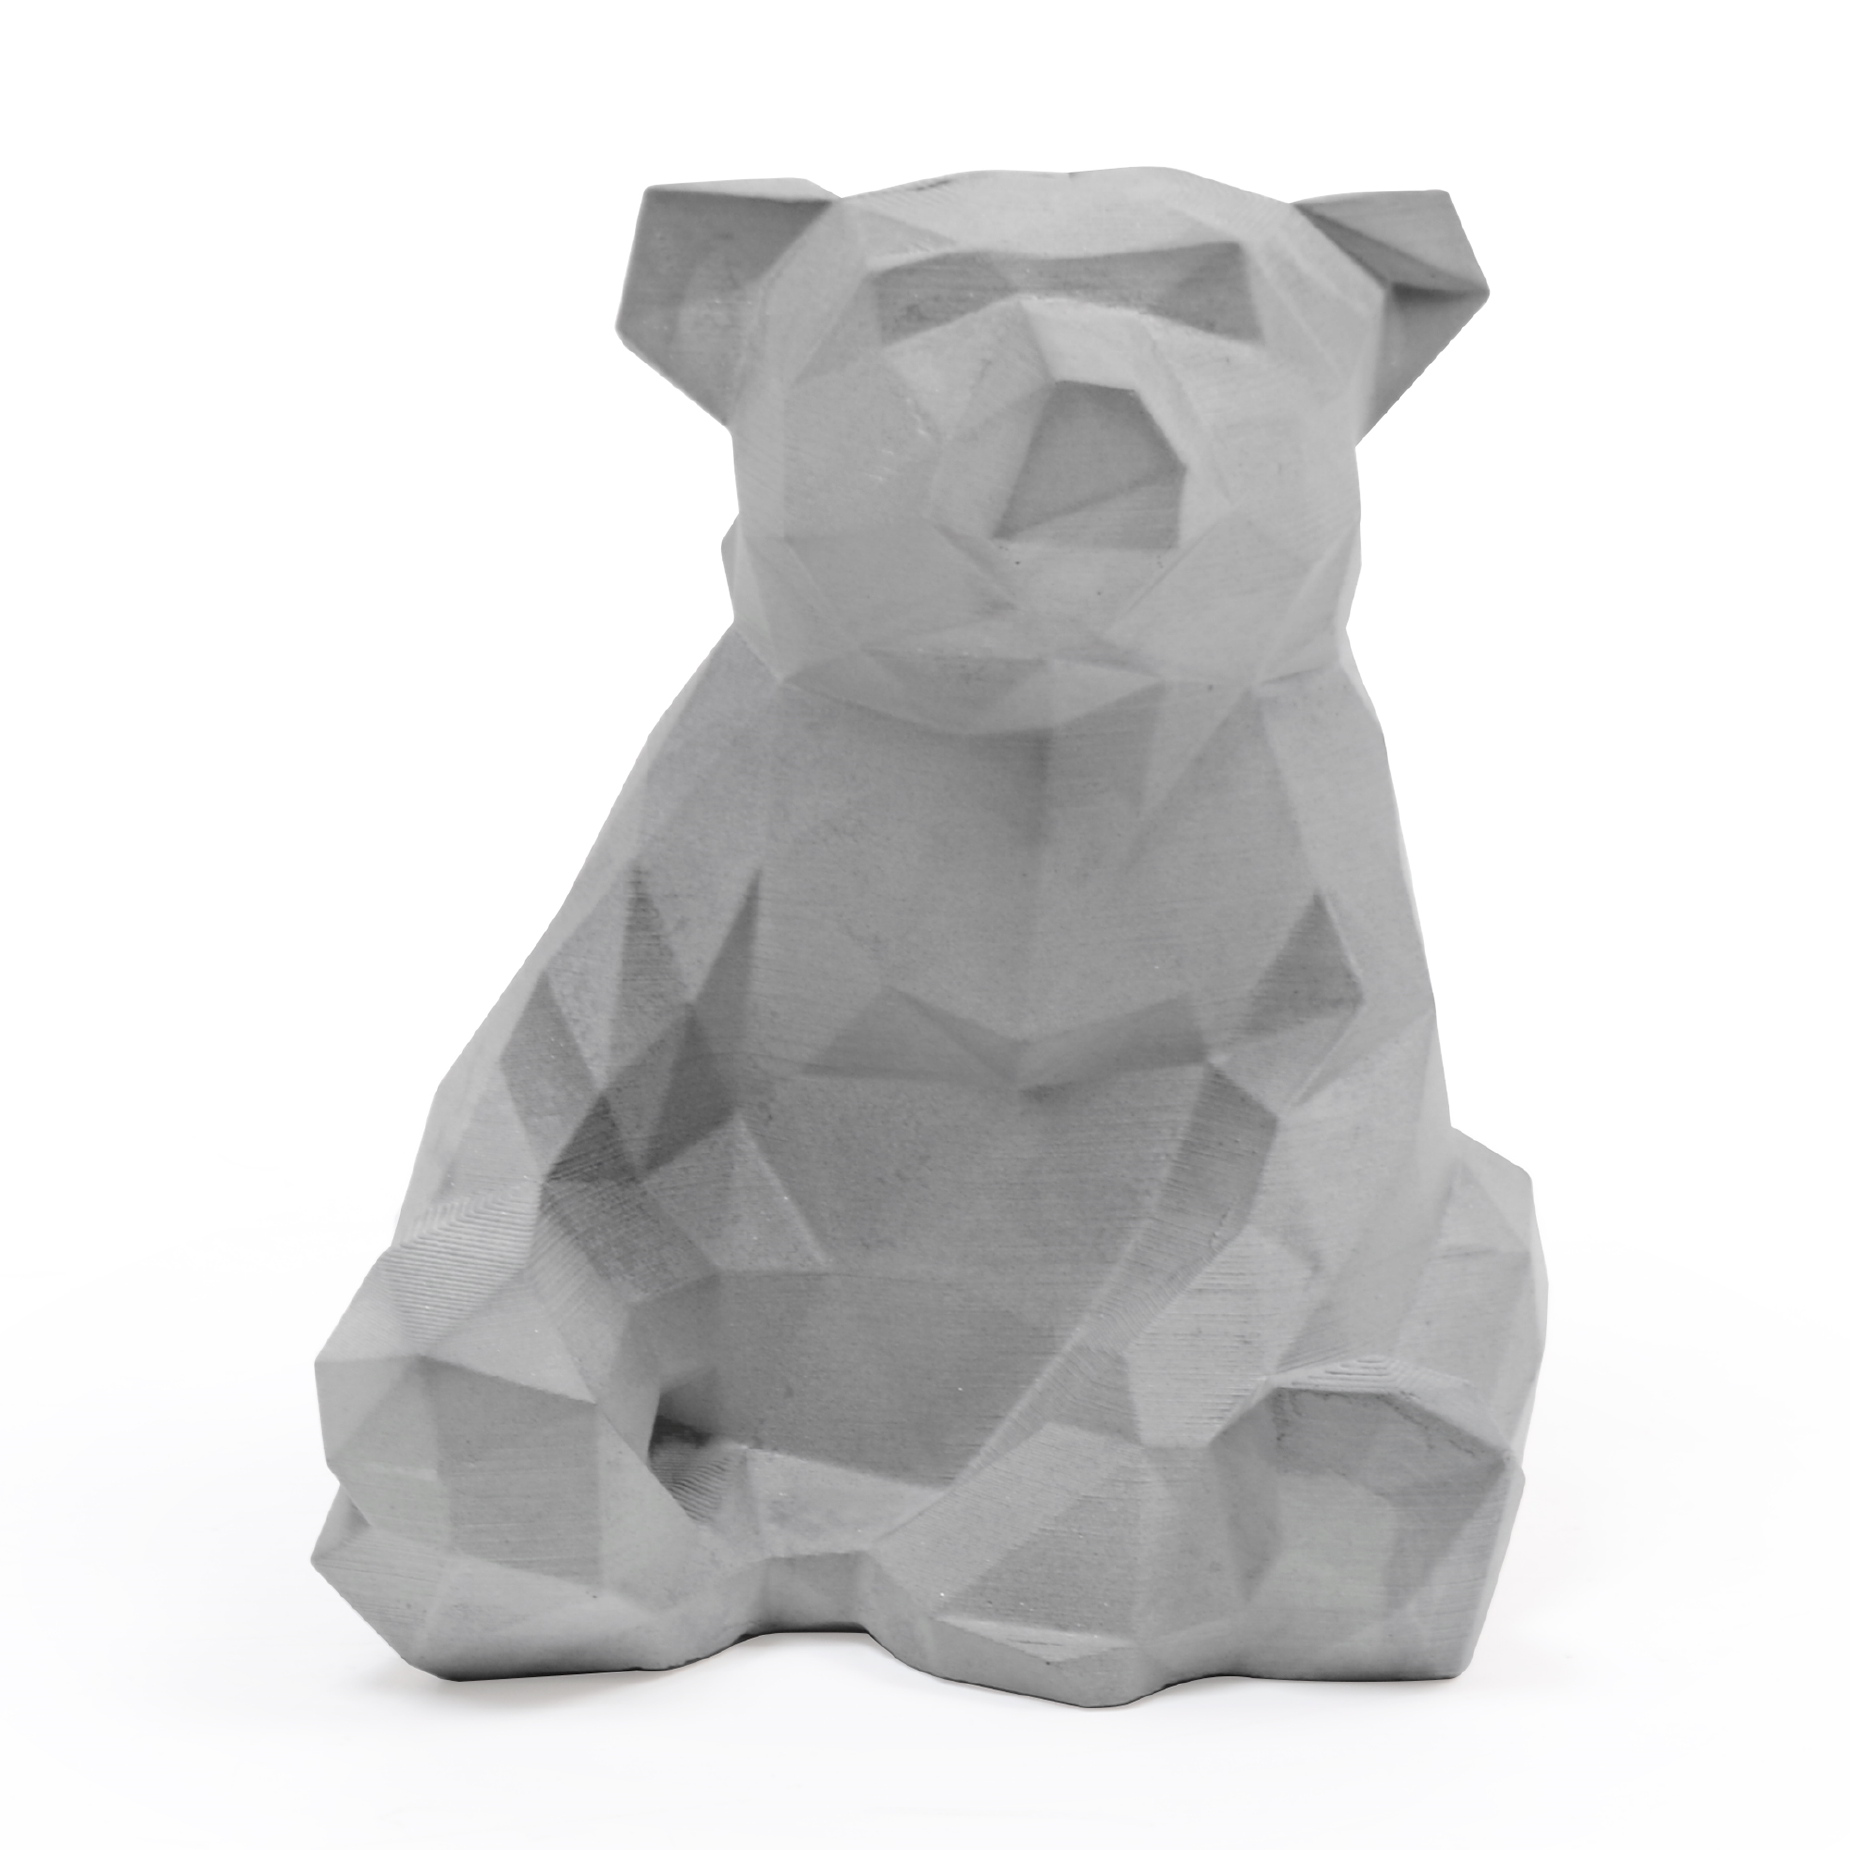 Escultura Geométrica Urso